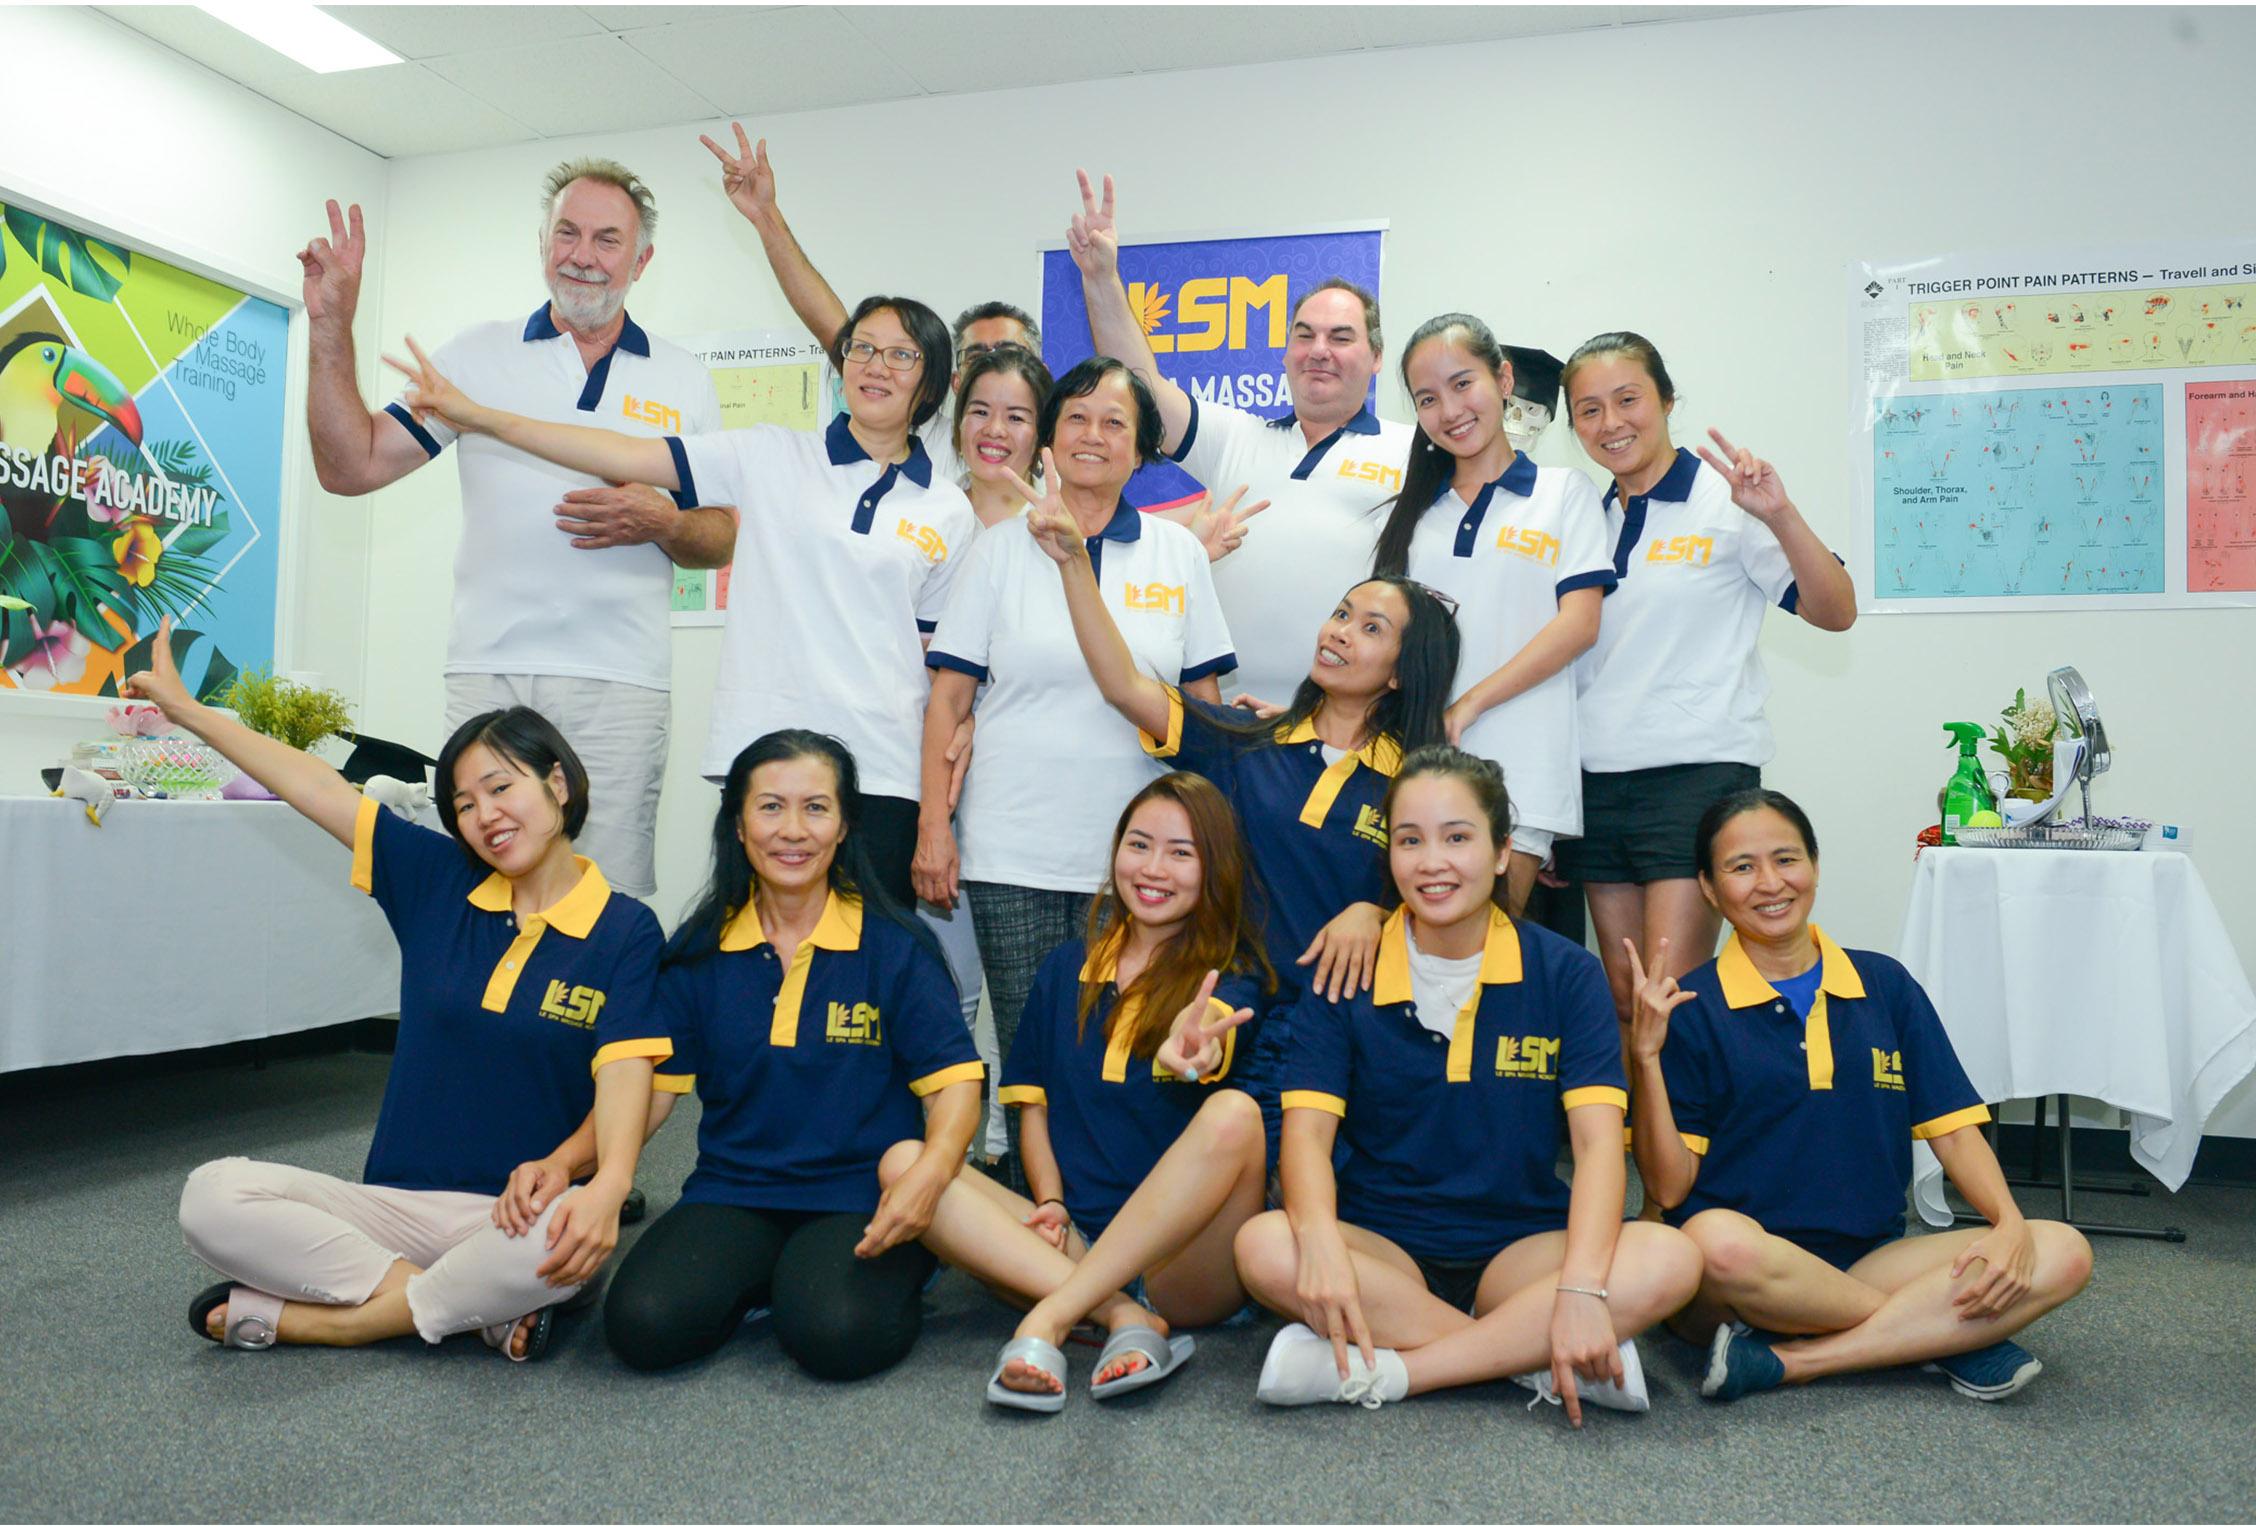 Certified Trainig Massage Class At Le Spa Massage Academy